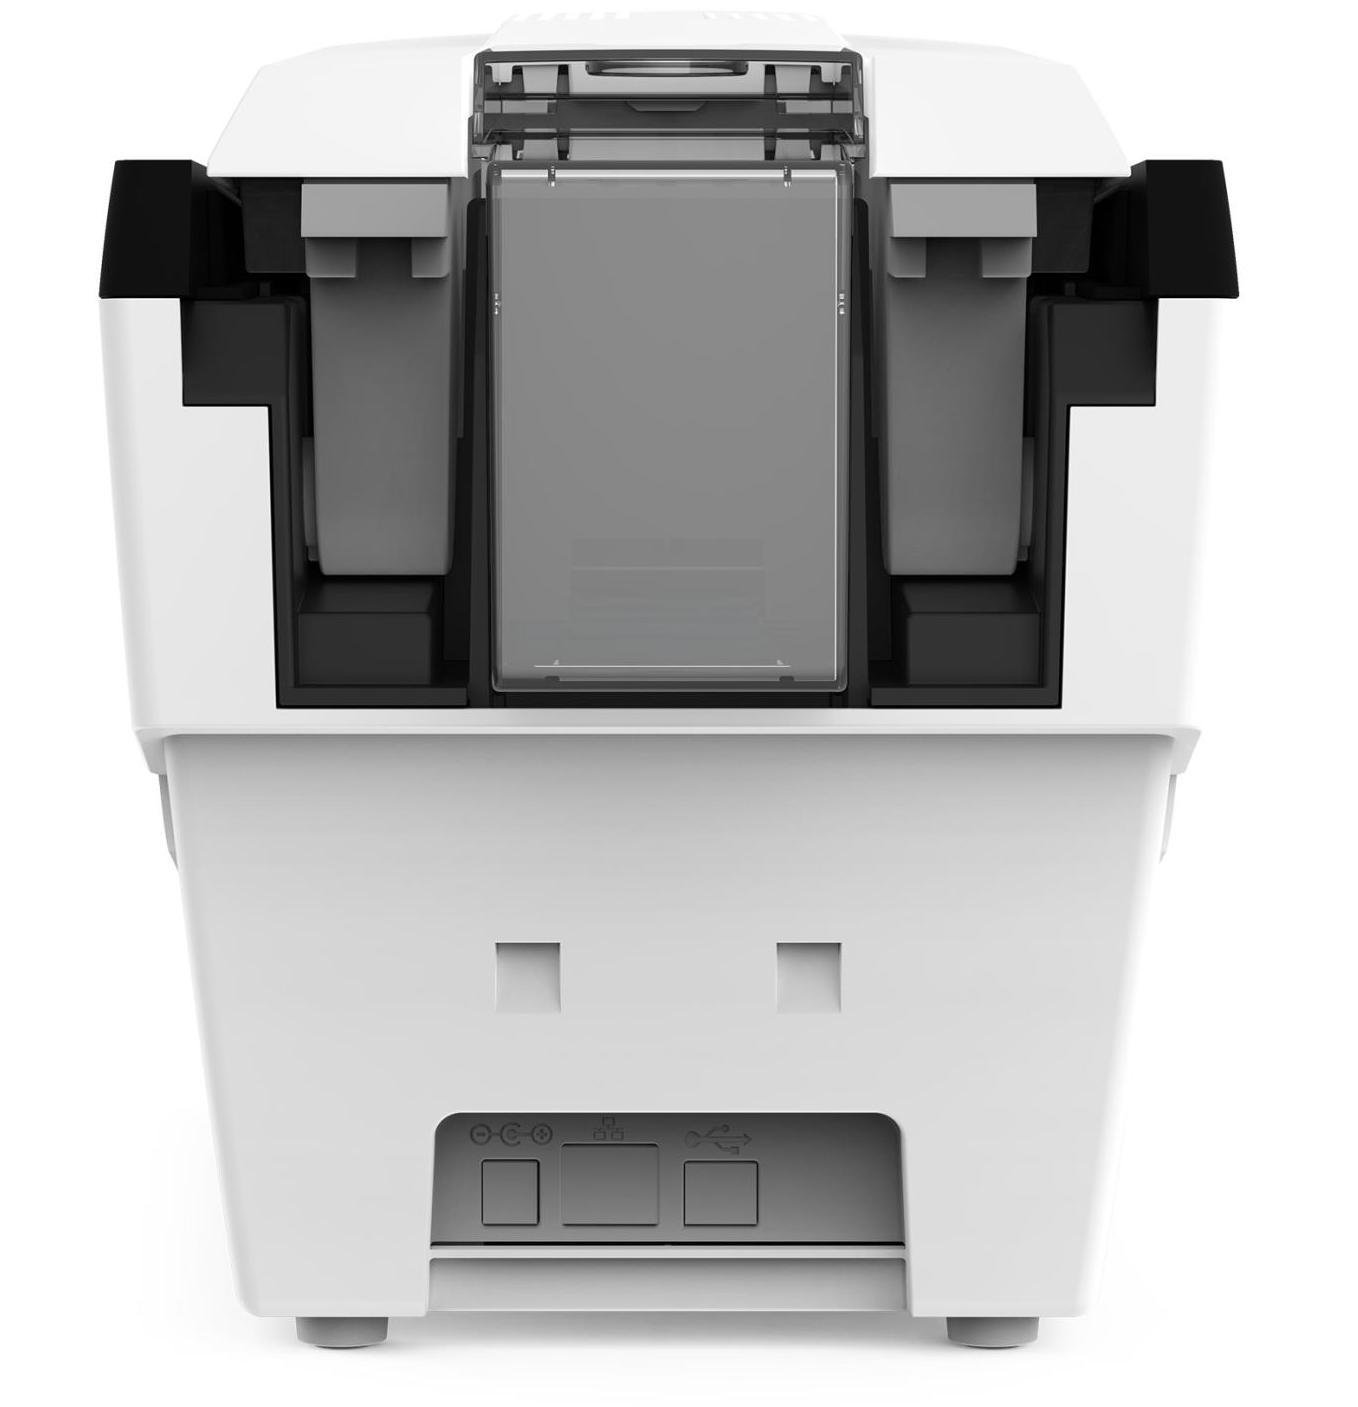 Magicard Rio Pro 360 Dual Sided Card Printer 3652-0021